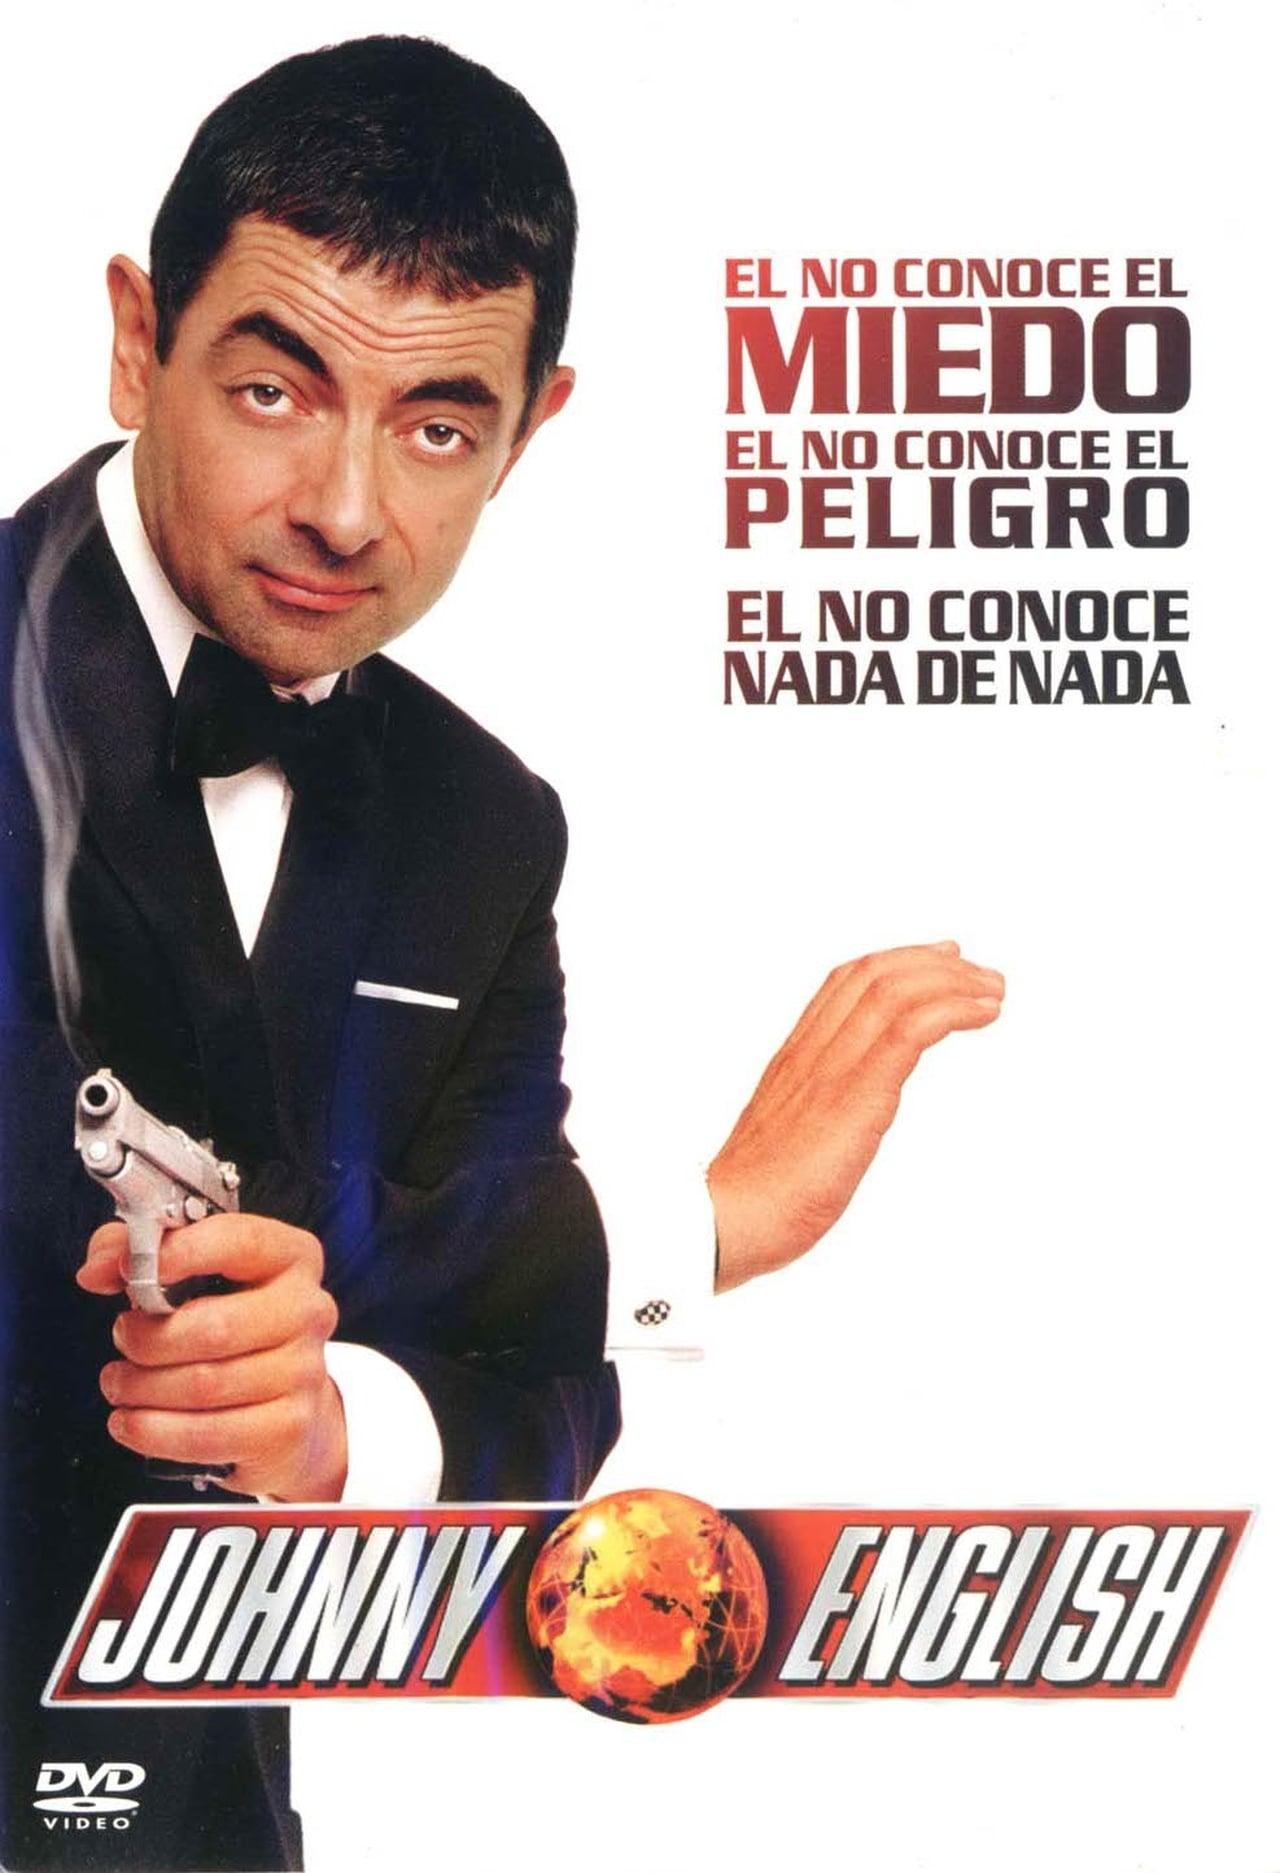 Johnny English Film